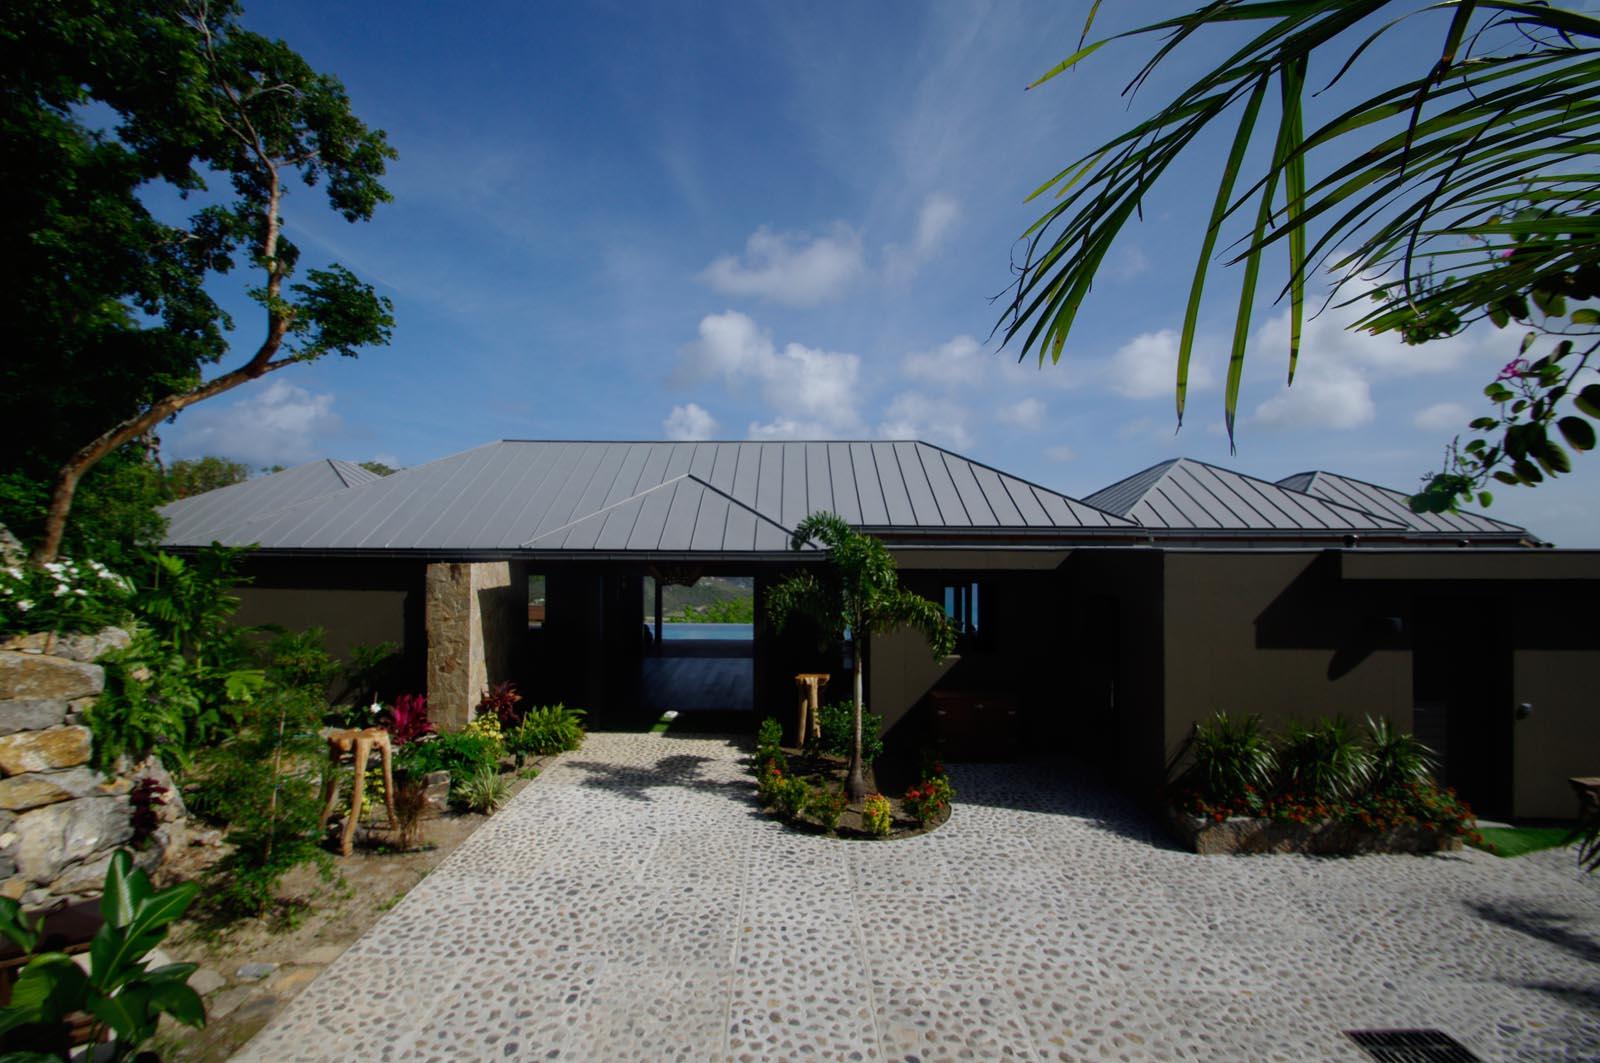 Villa de Moh have sufficient parking space for several cars.